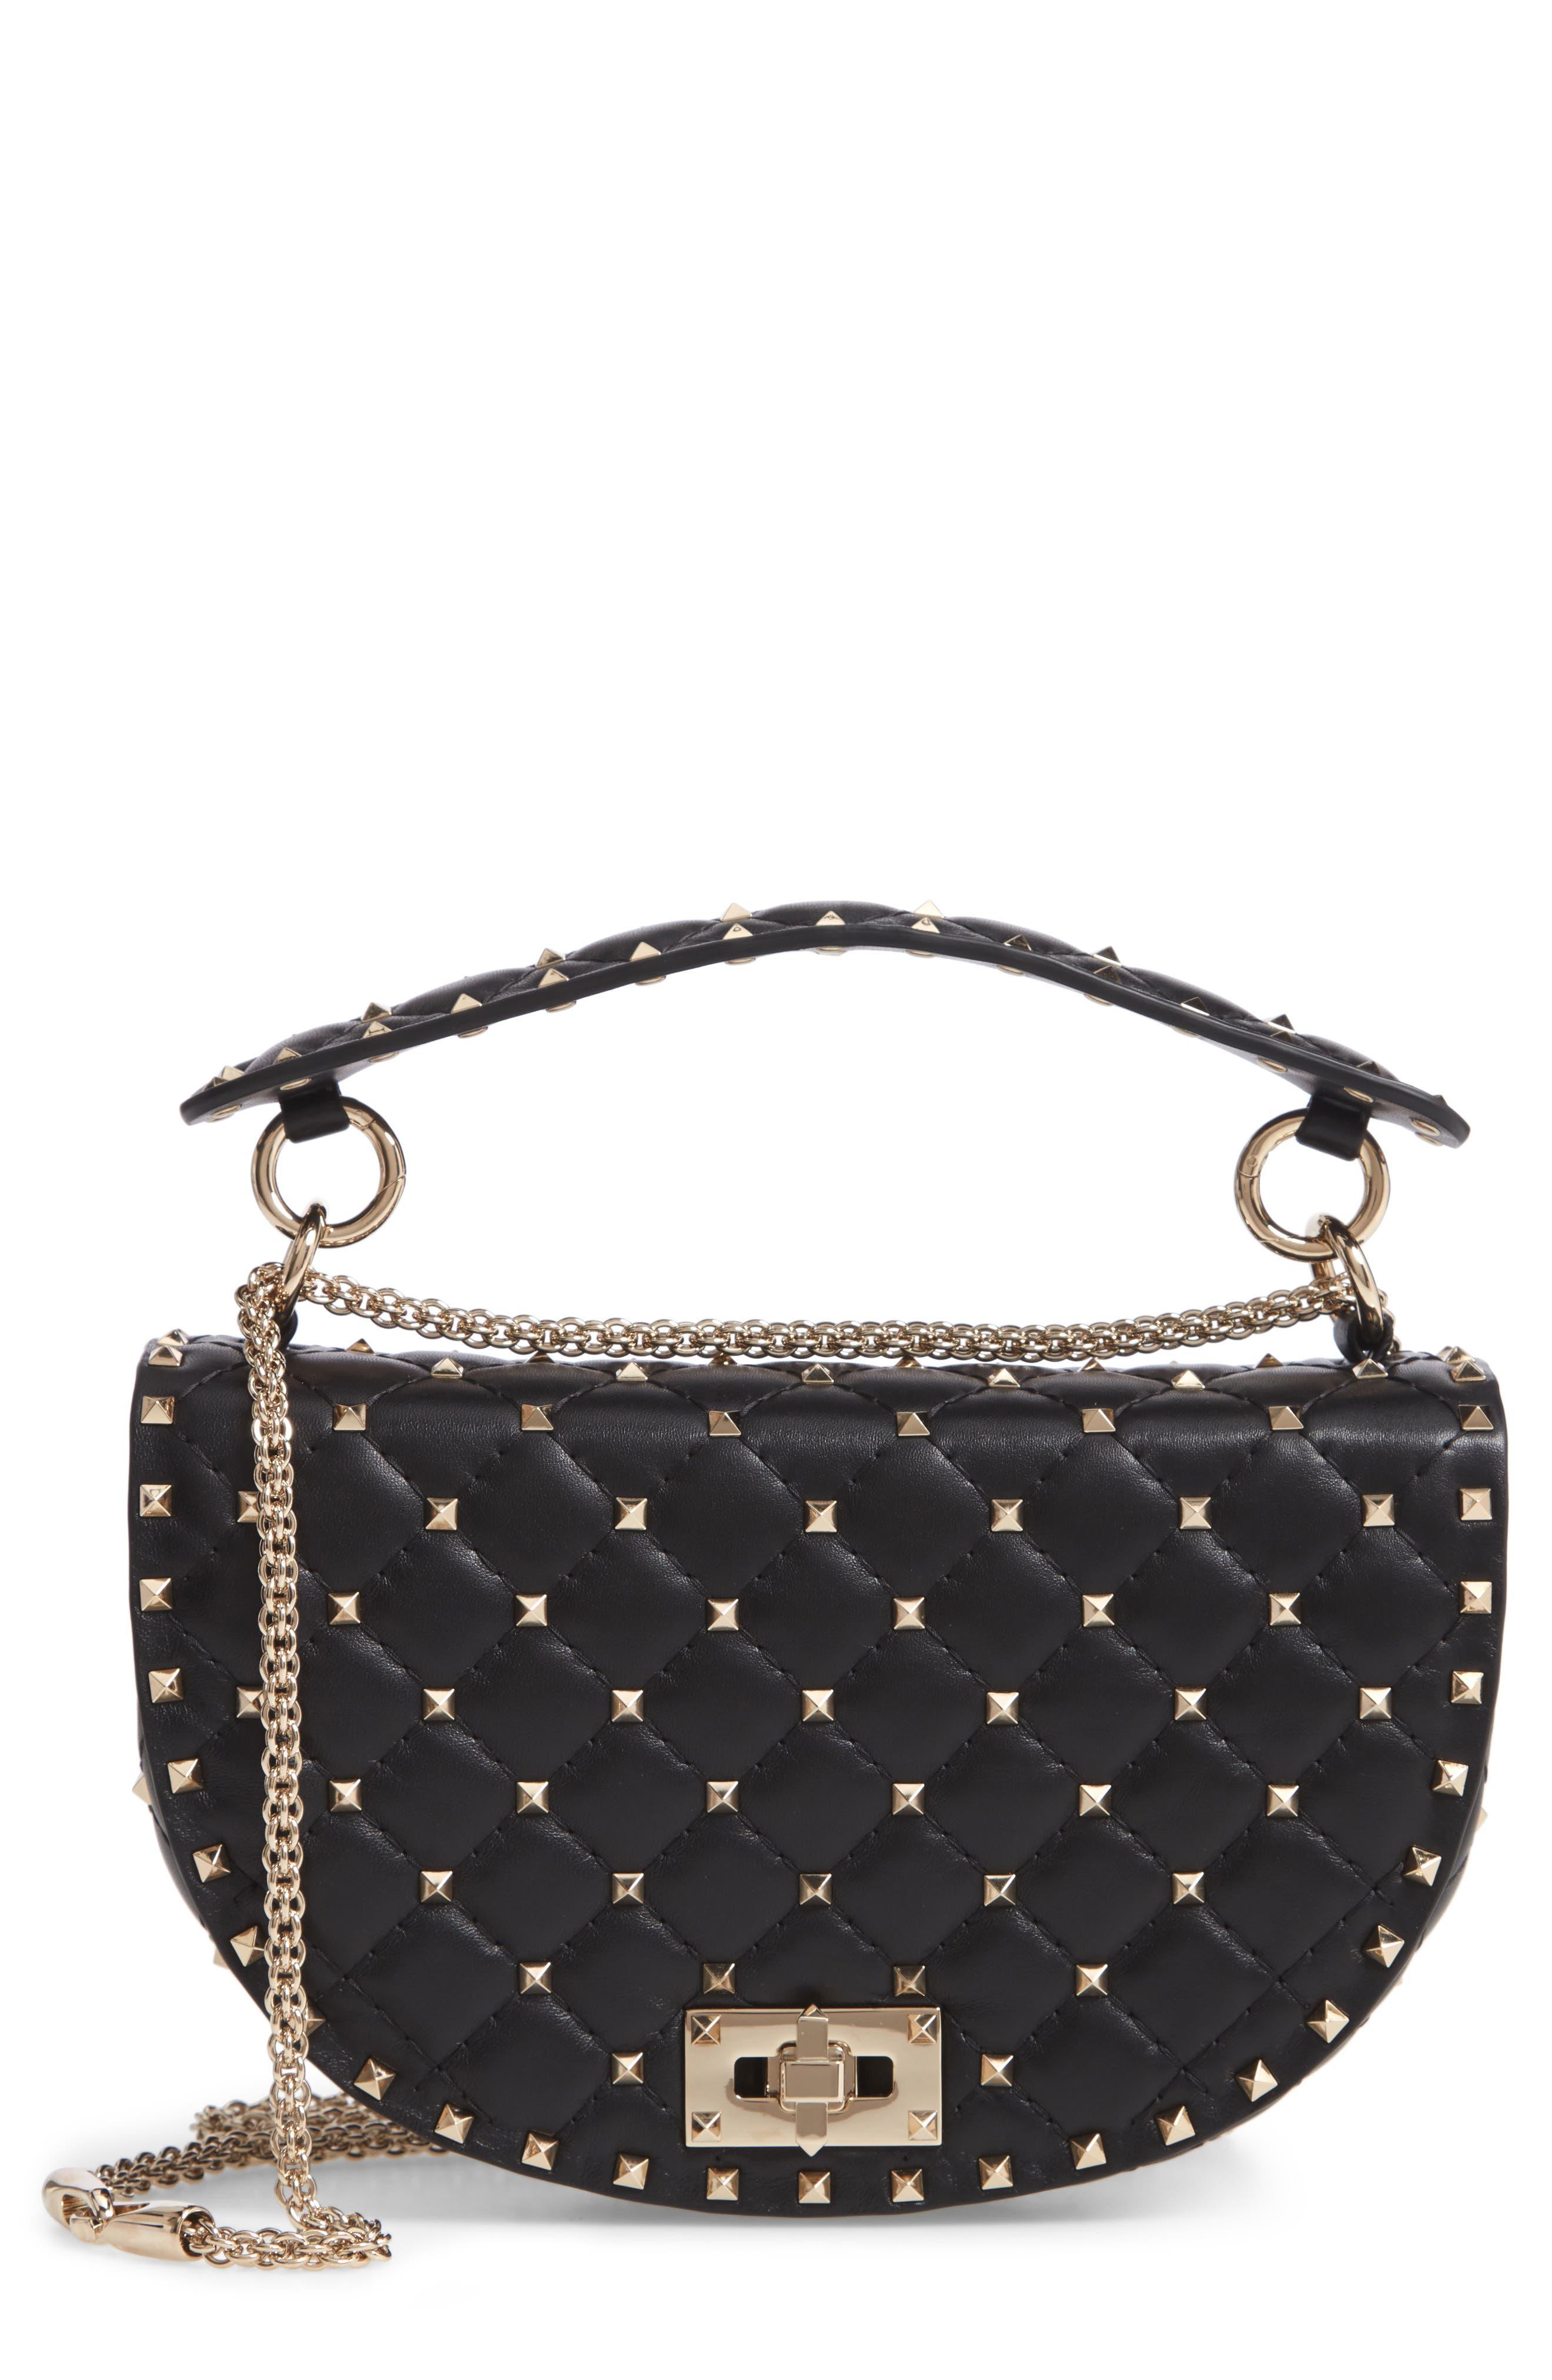 VALENTINO GARAVANI, Rockstud Spike Leather Saddle Bag, Main thumbnail 1, color, NERO